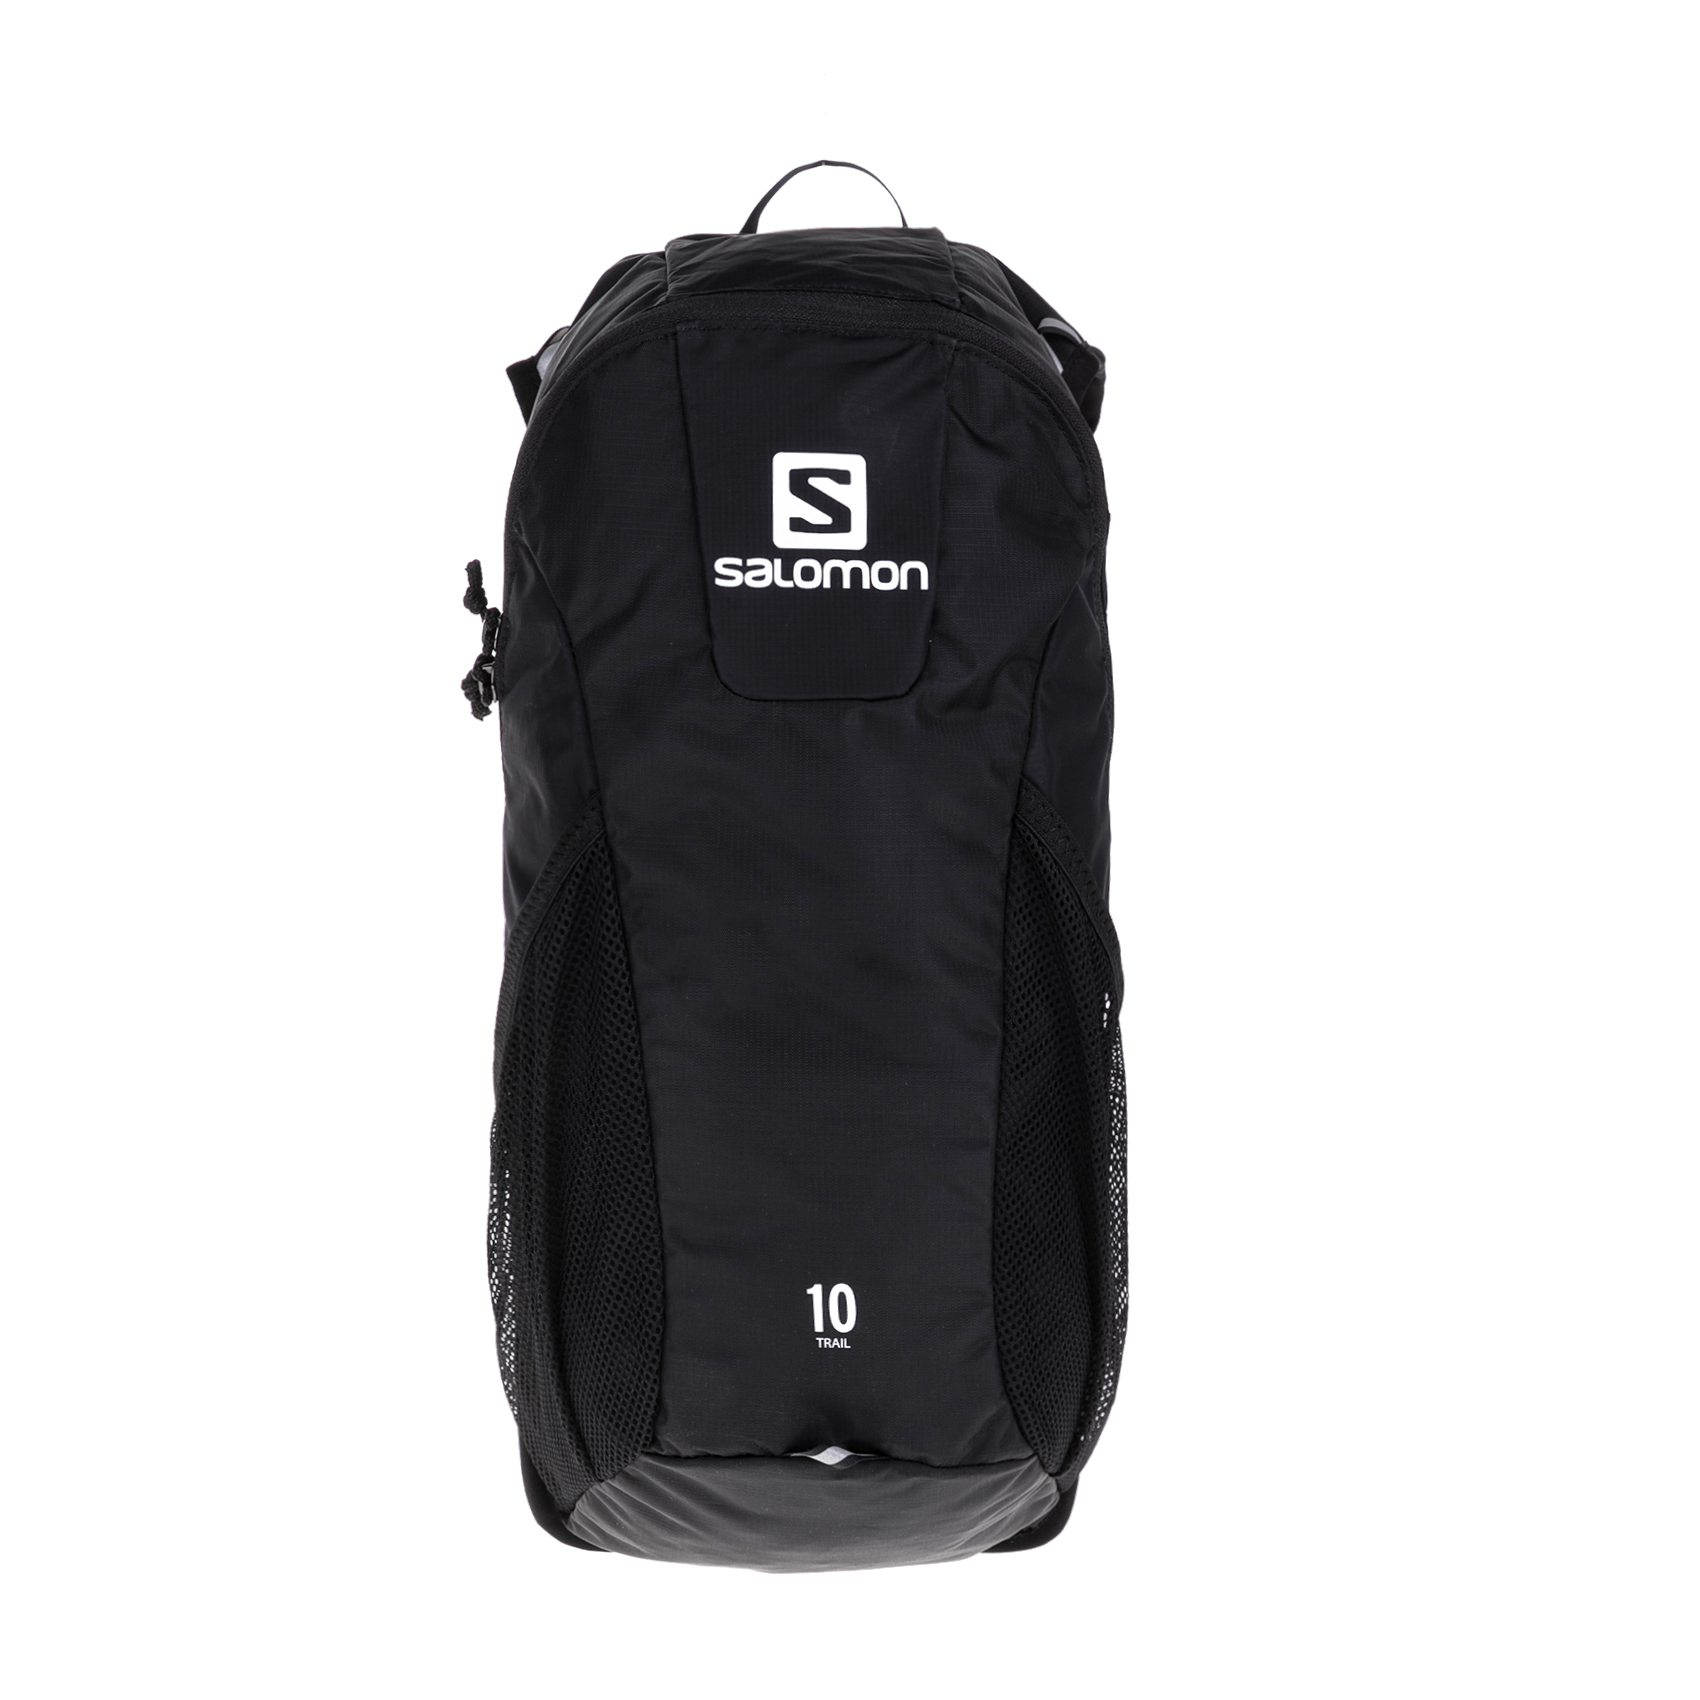 SALOMON – Σακίδιο πλάτης SALOMON PACKS BAG TRAIL 10 μαύρο 1623502.0-0101